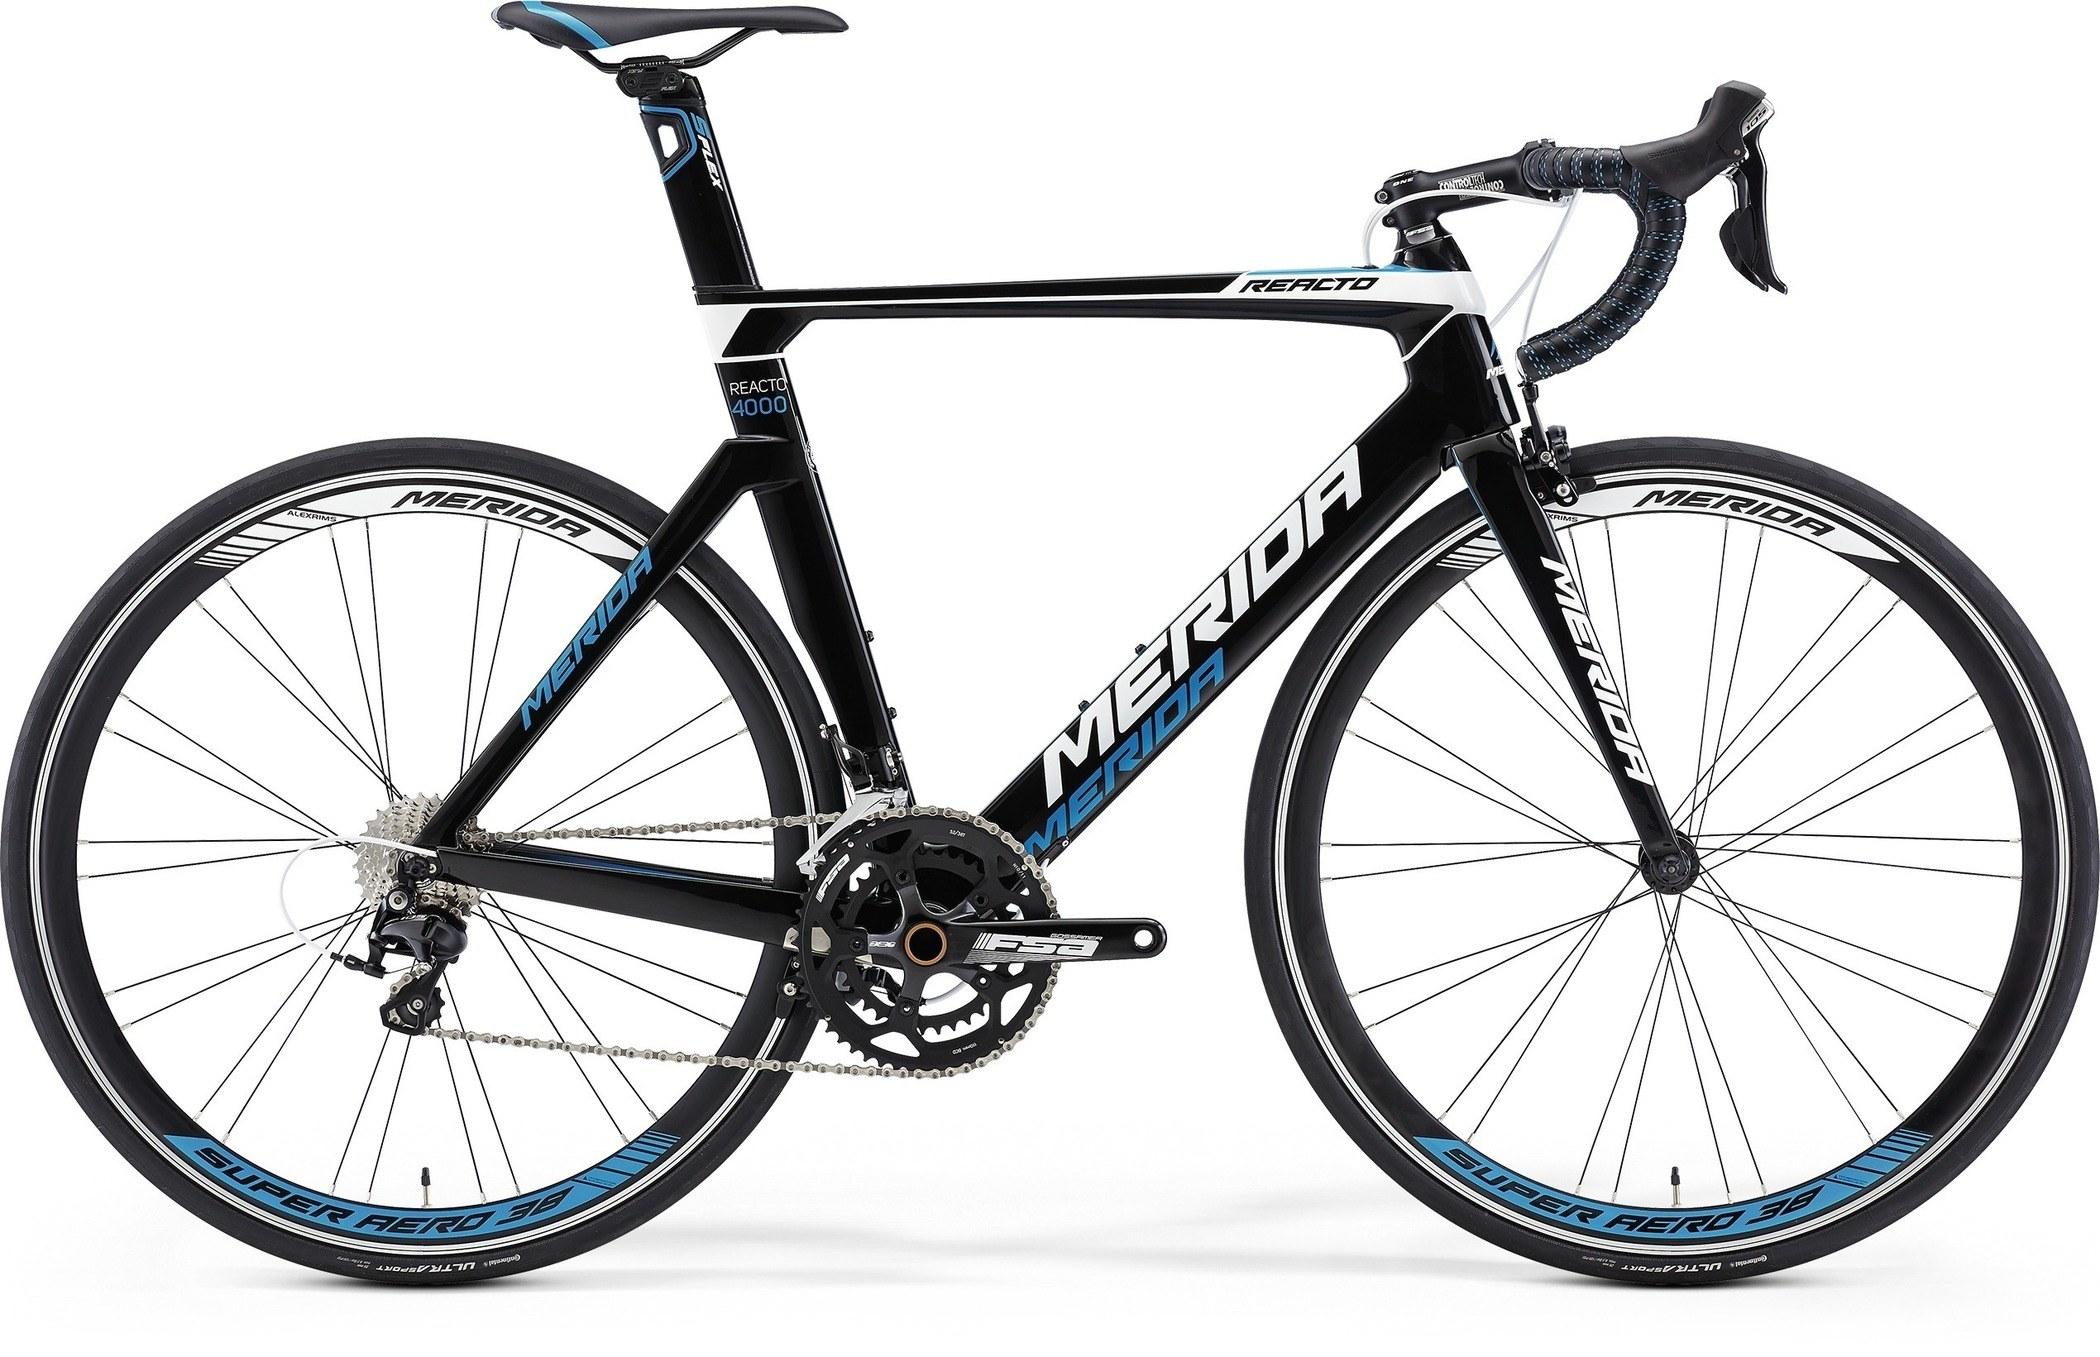 Merida Reacto 4000 Road Bike - Buy Online   Pedal Revolution